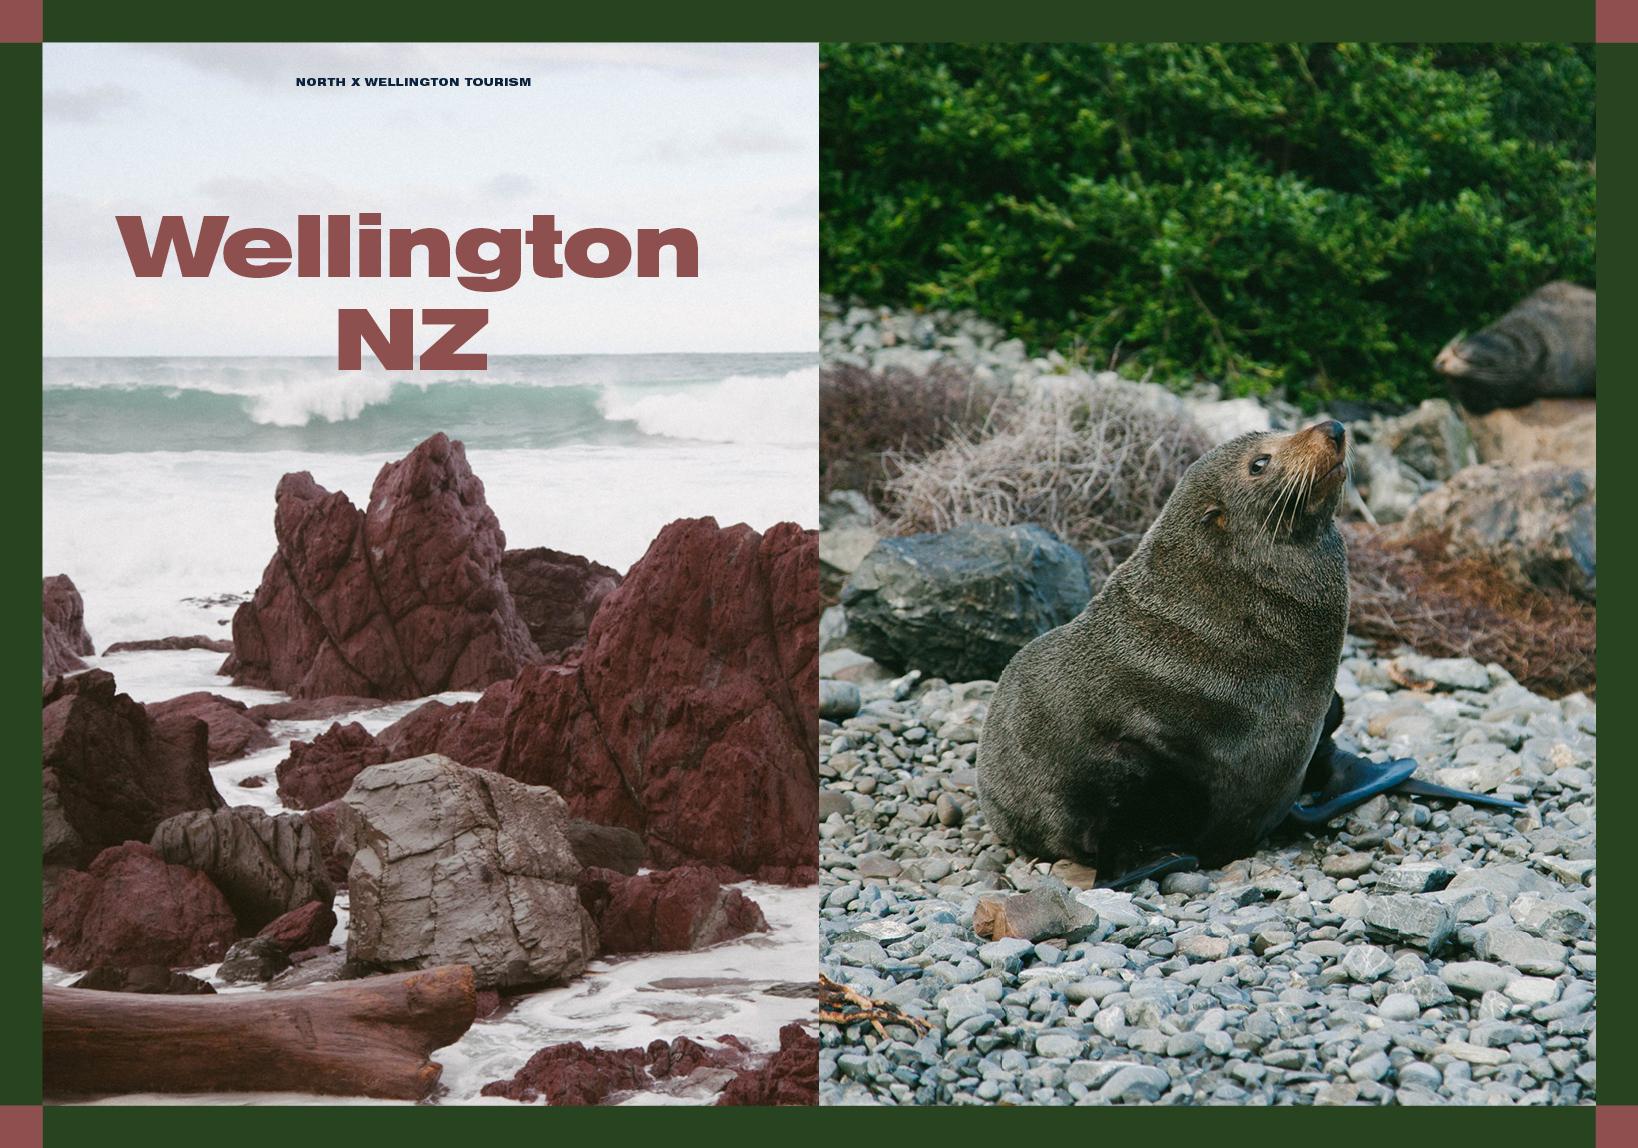 northi14p52 56 Wellington.jpg